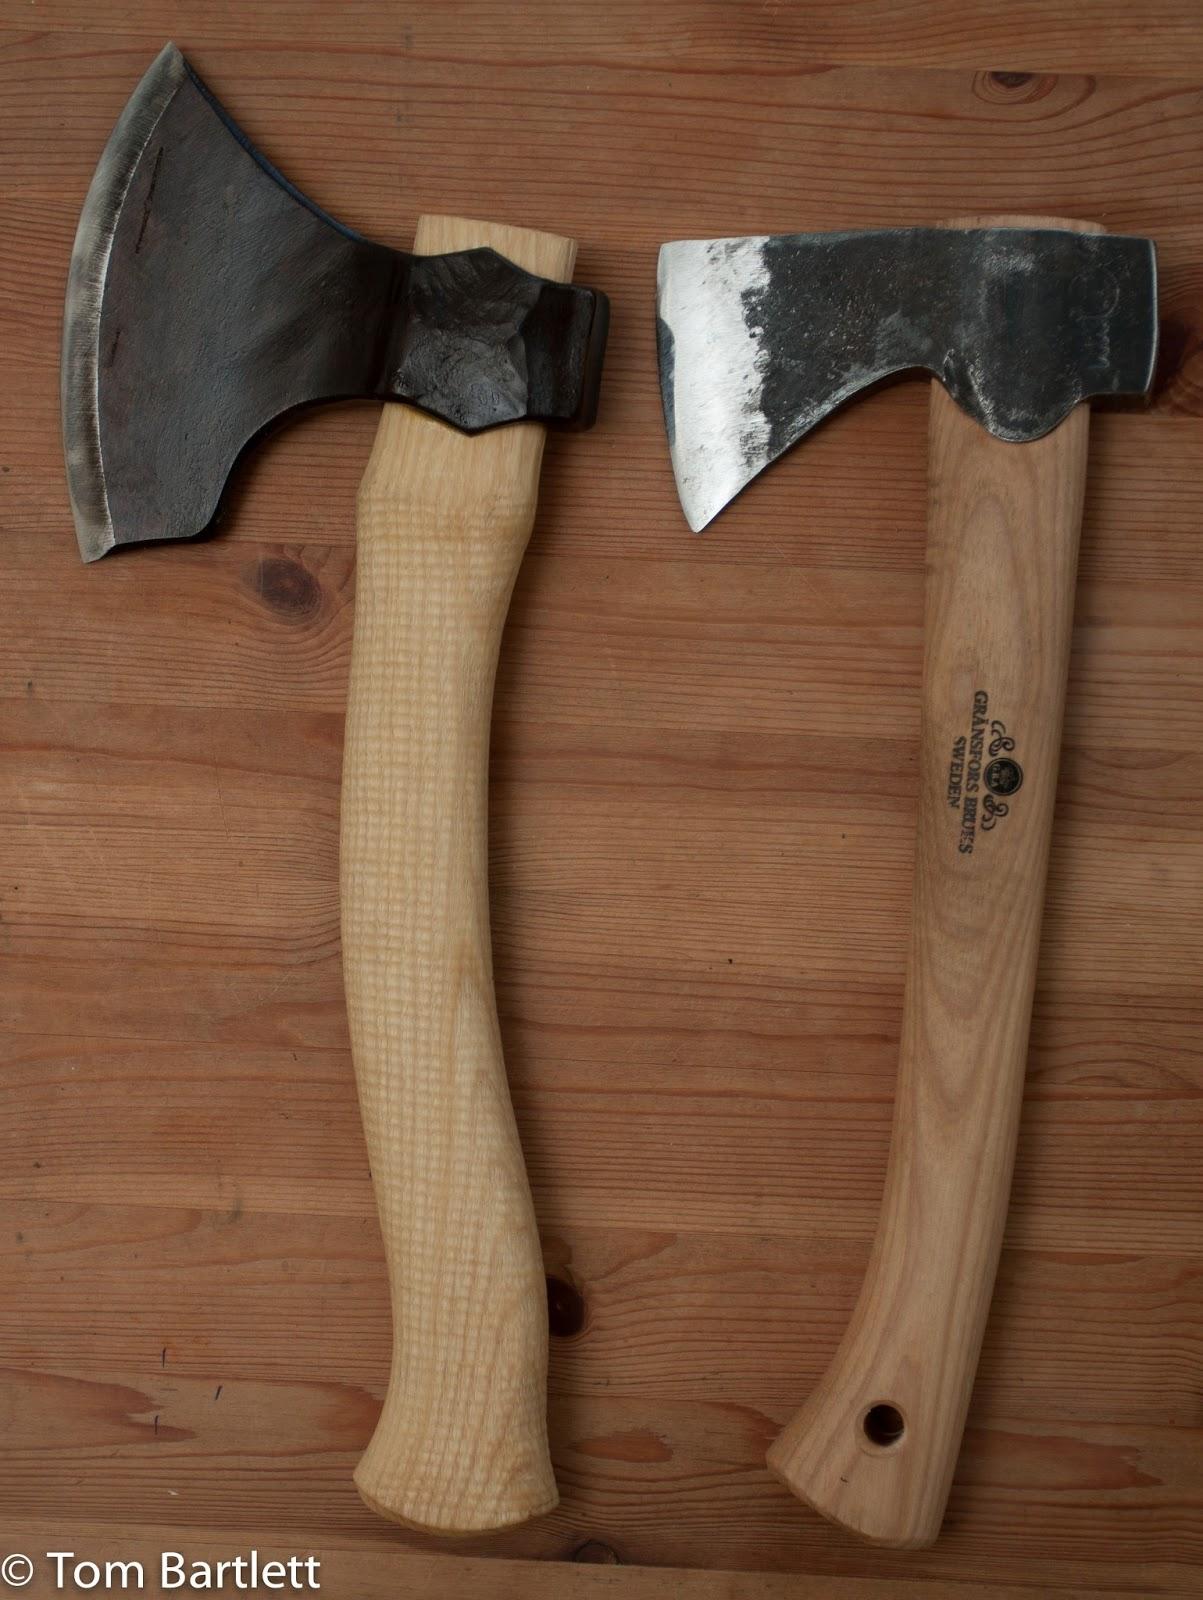 Carved Spoons: April 2013